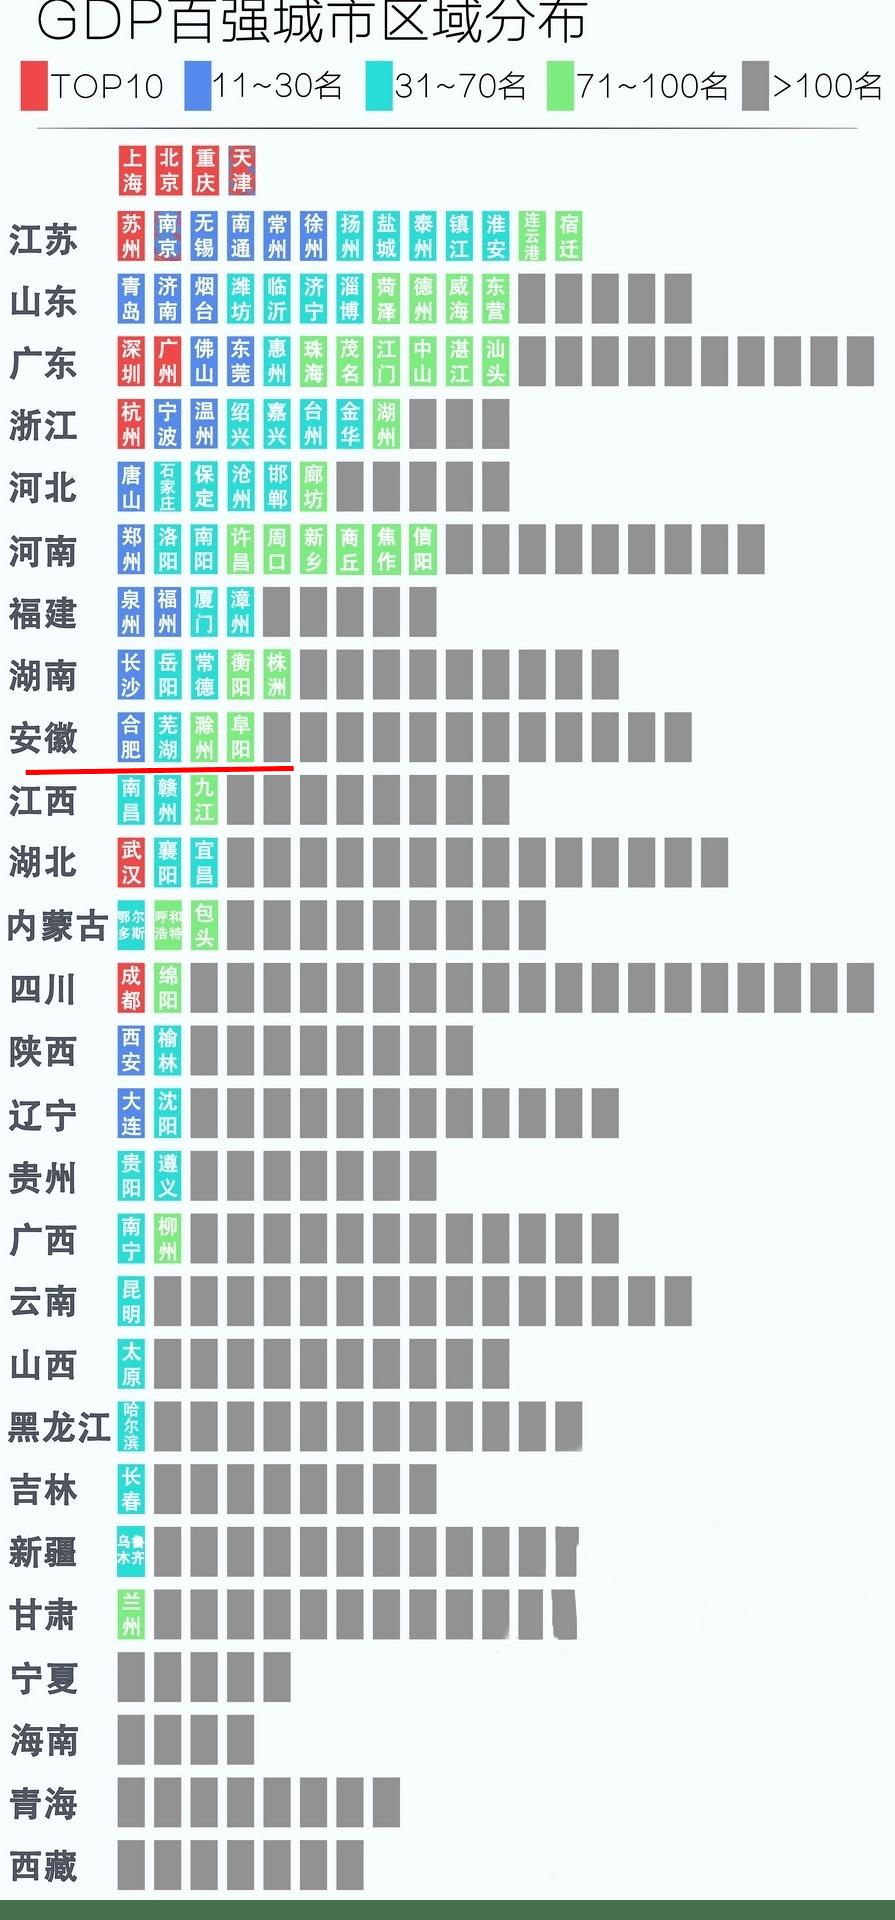 2019年张店gdp_2019年太原gdp